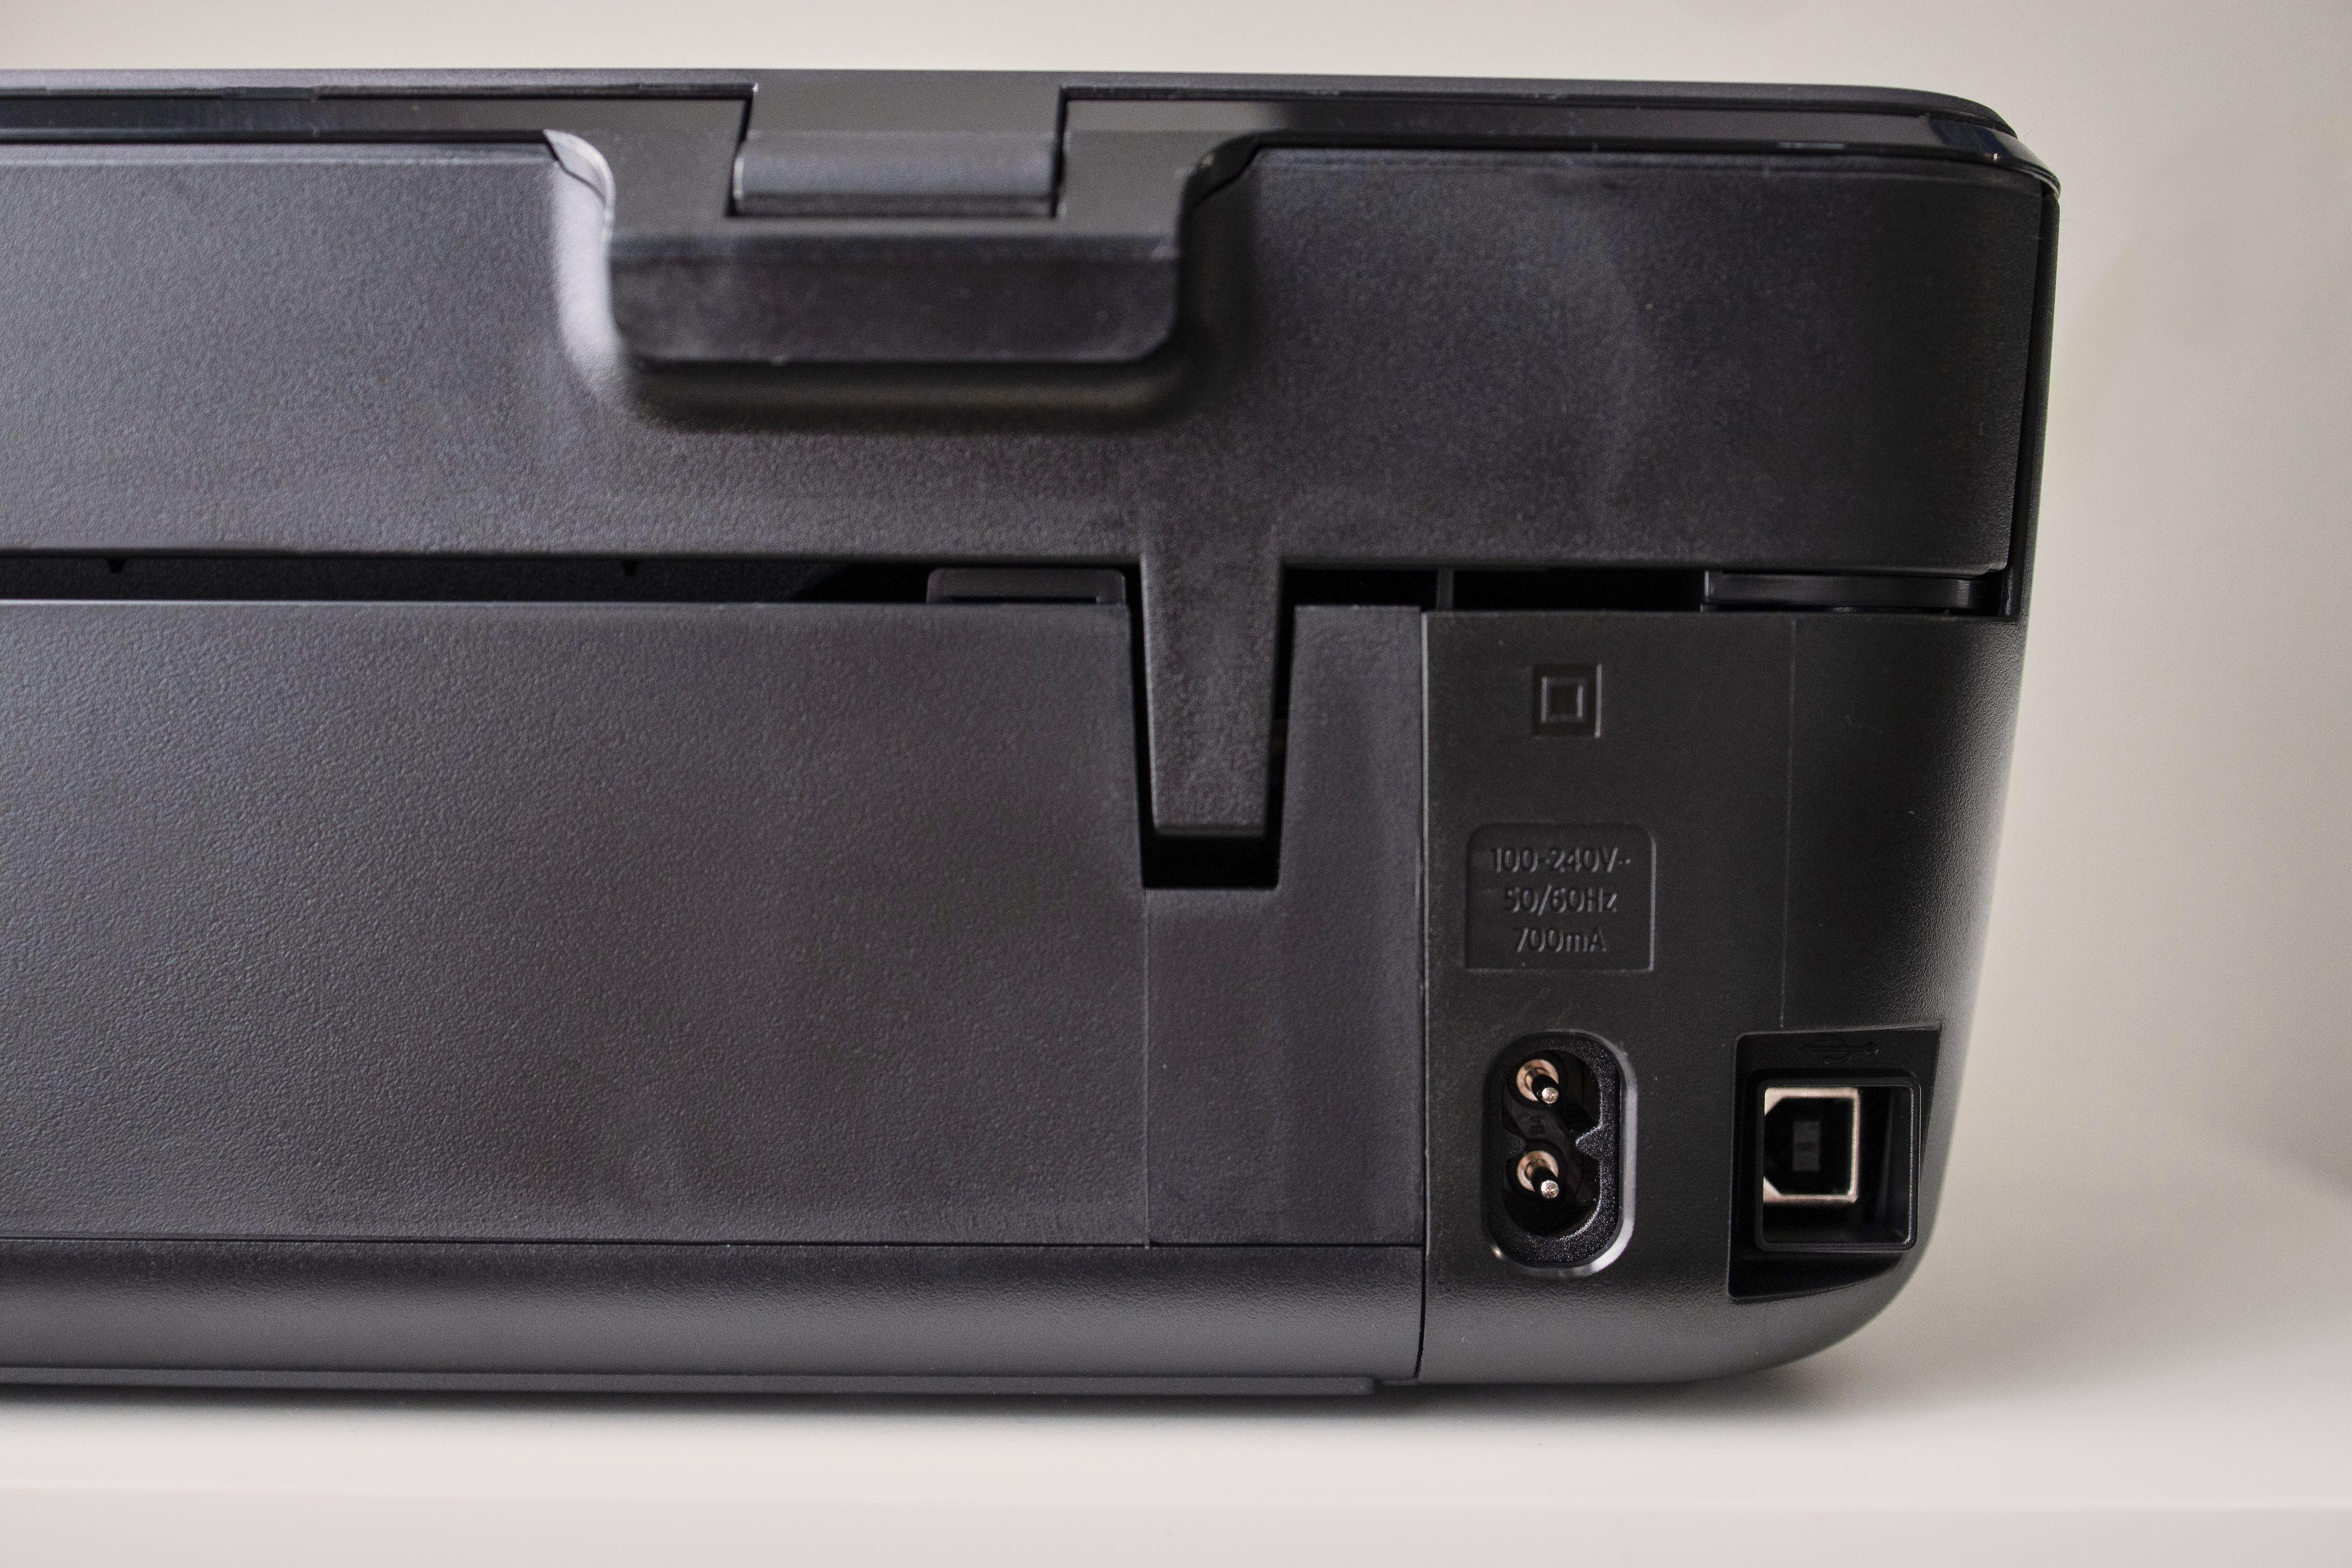 Hp Envy 4520 Review Good Design Lackluster Features